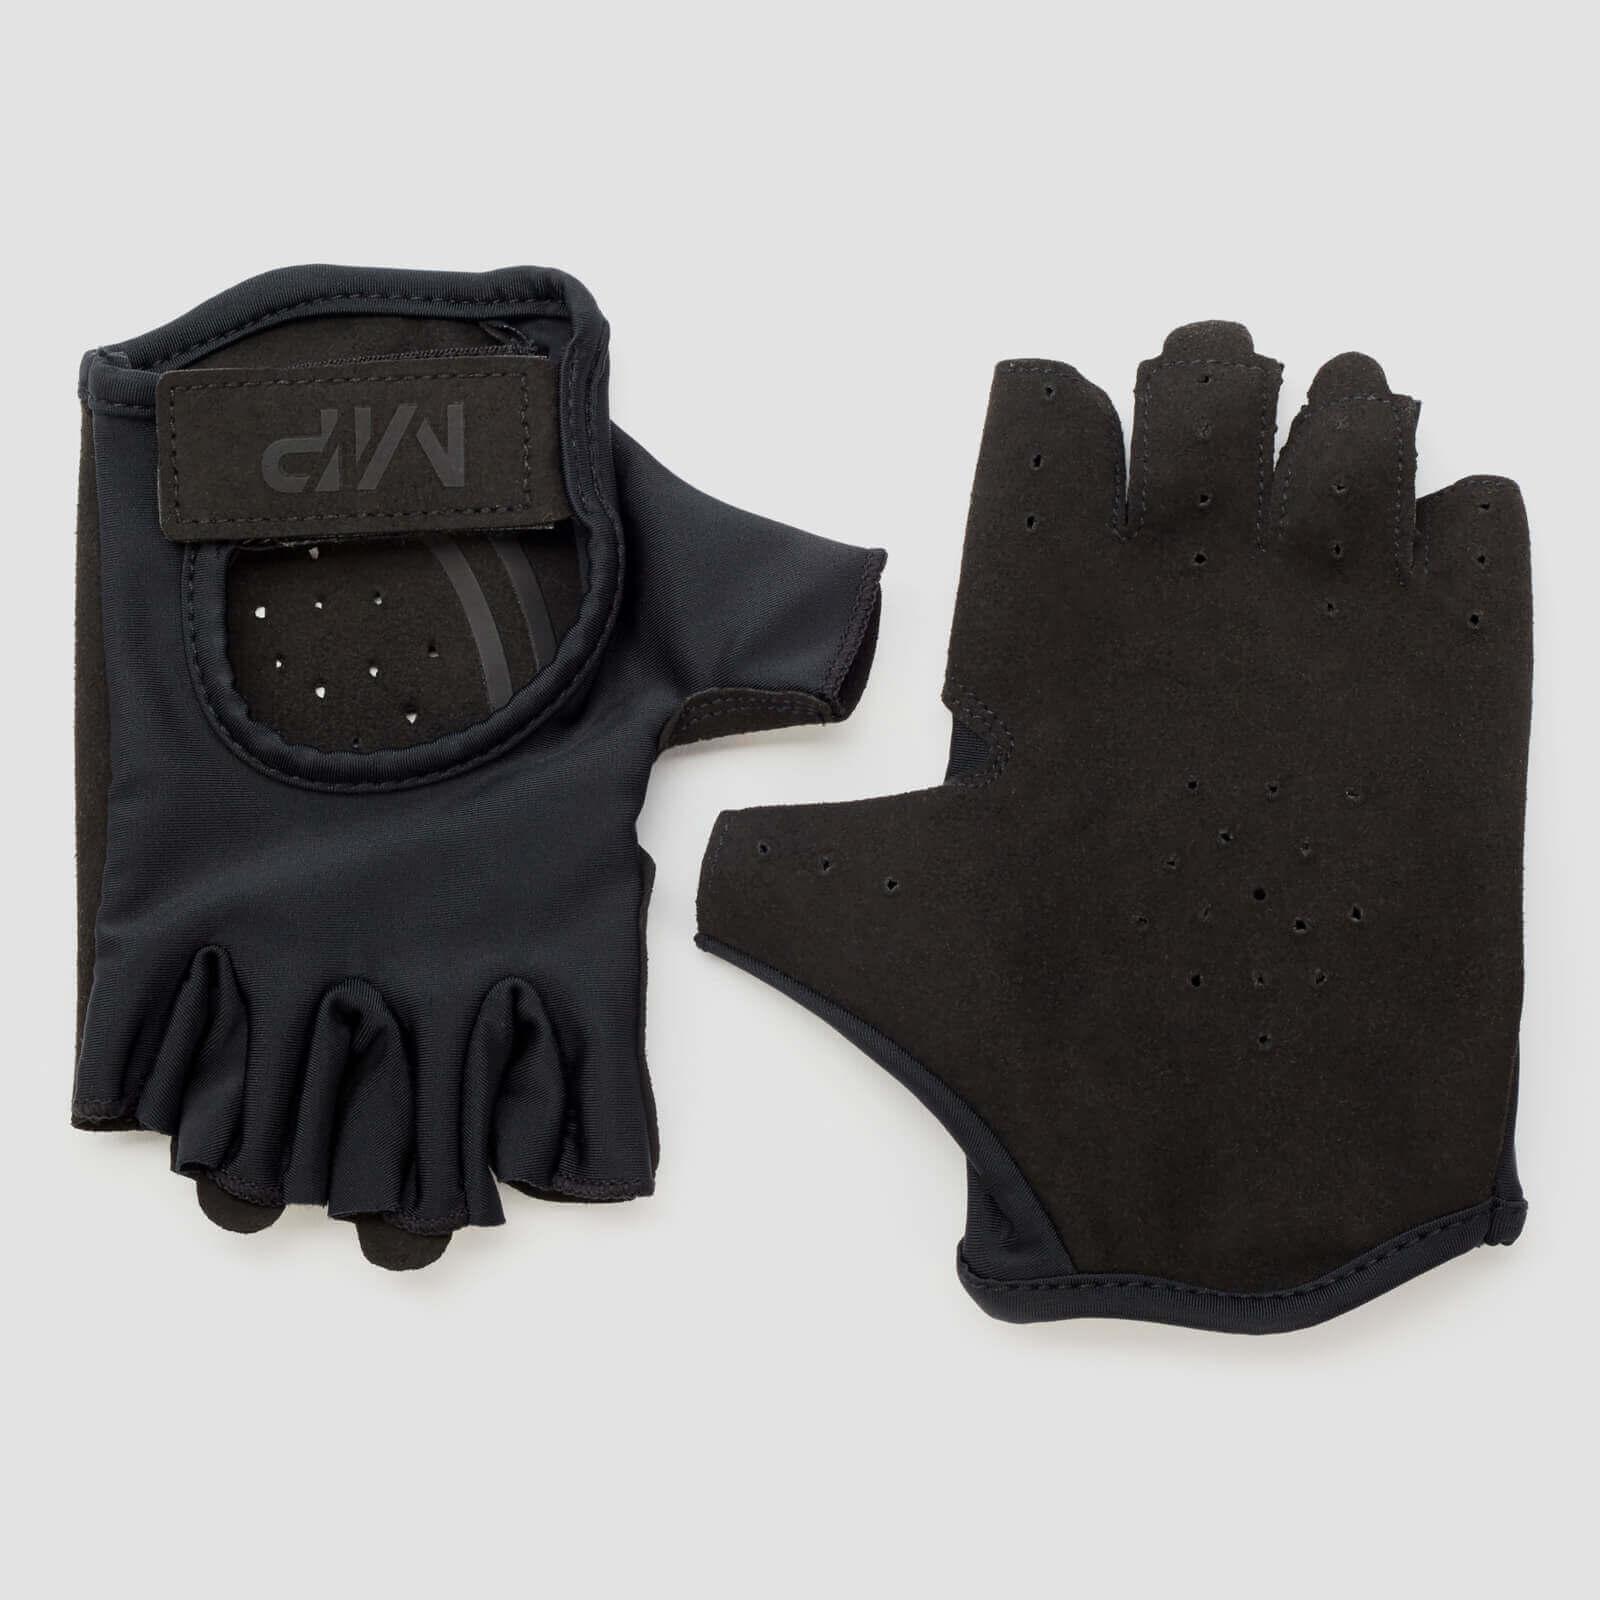 MP Men's Lifting Gloves - L - Black